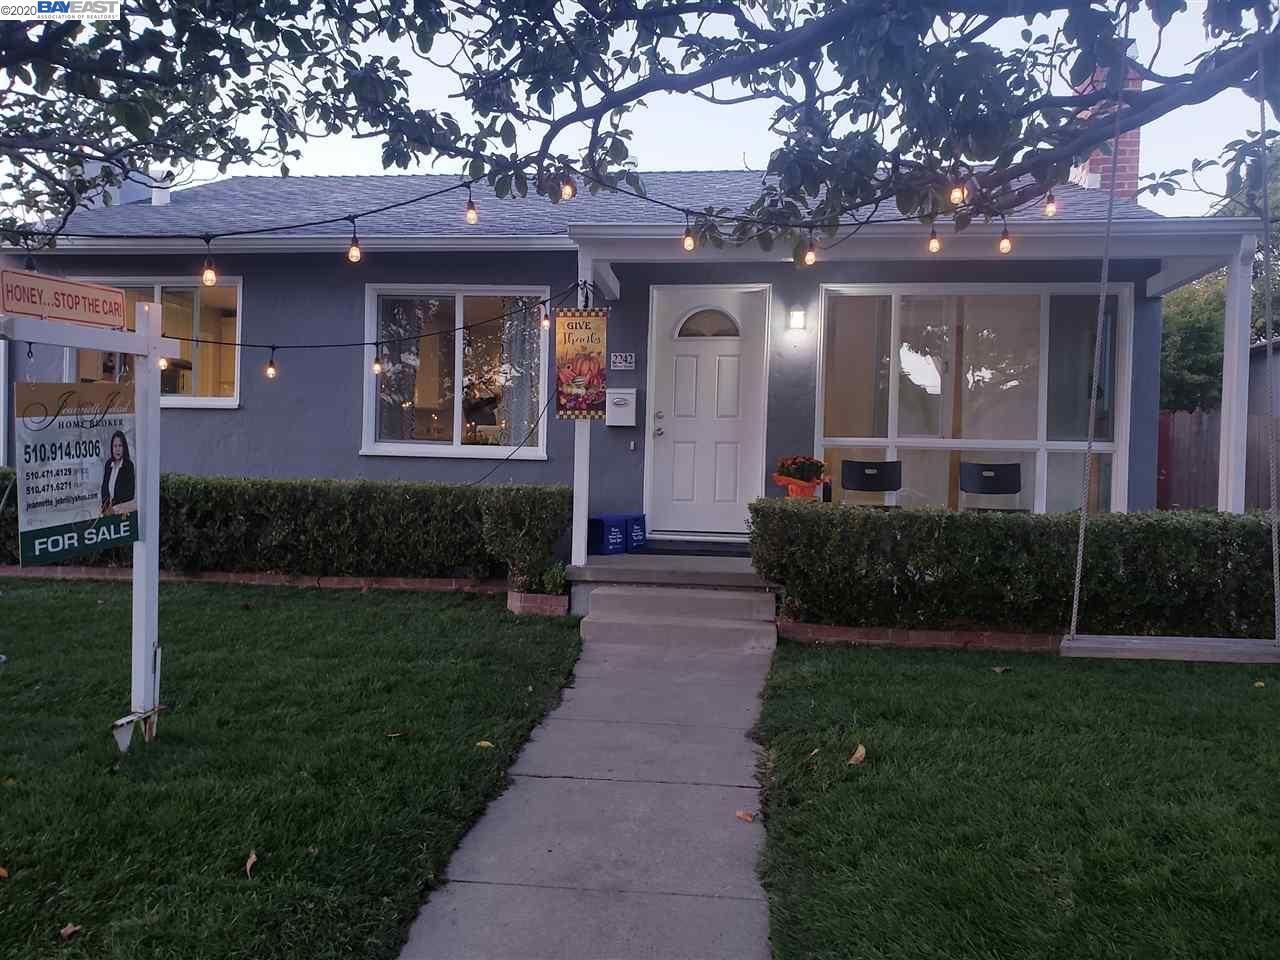 Photo for 2242 Farley, CASTRO VALLEY, CA 94546 (MLS # 40925789)